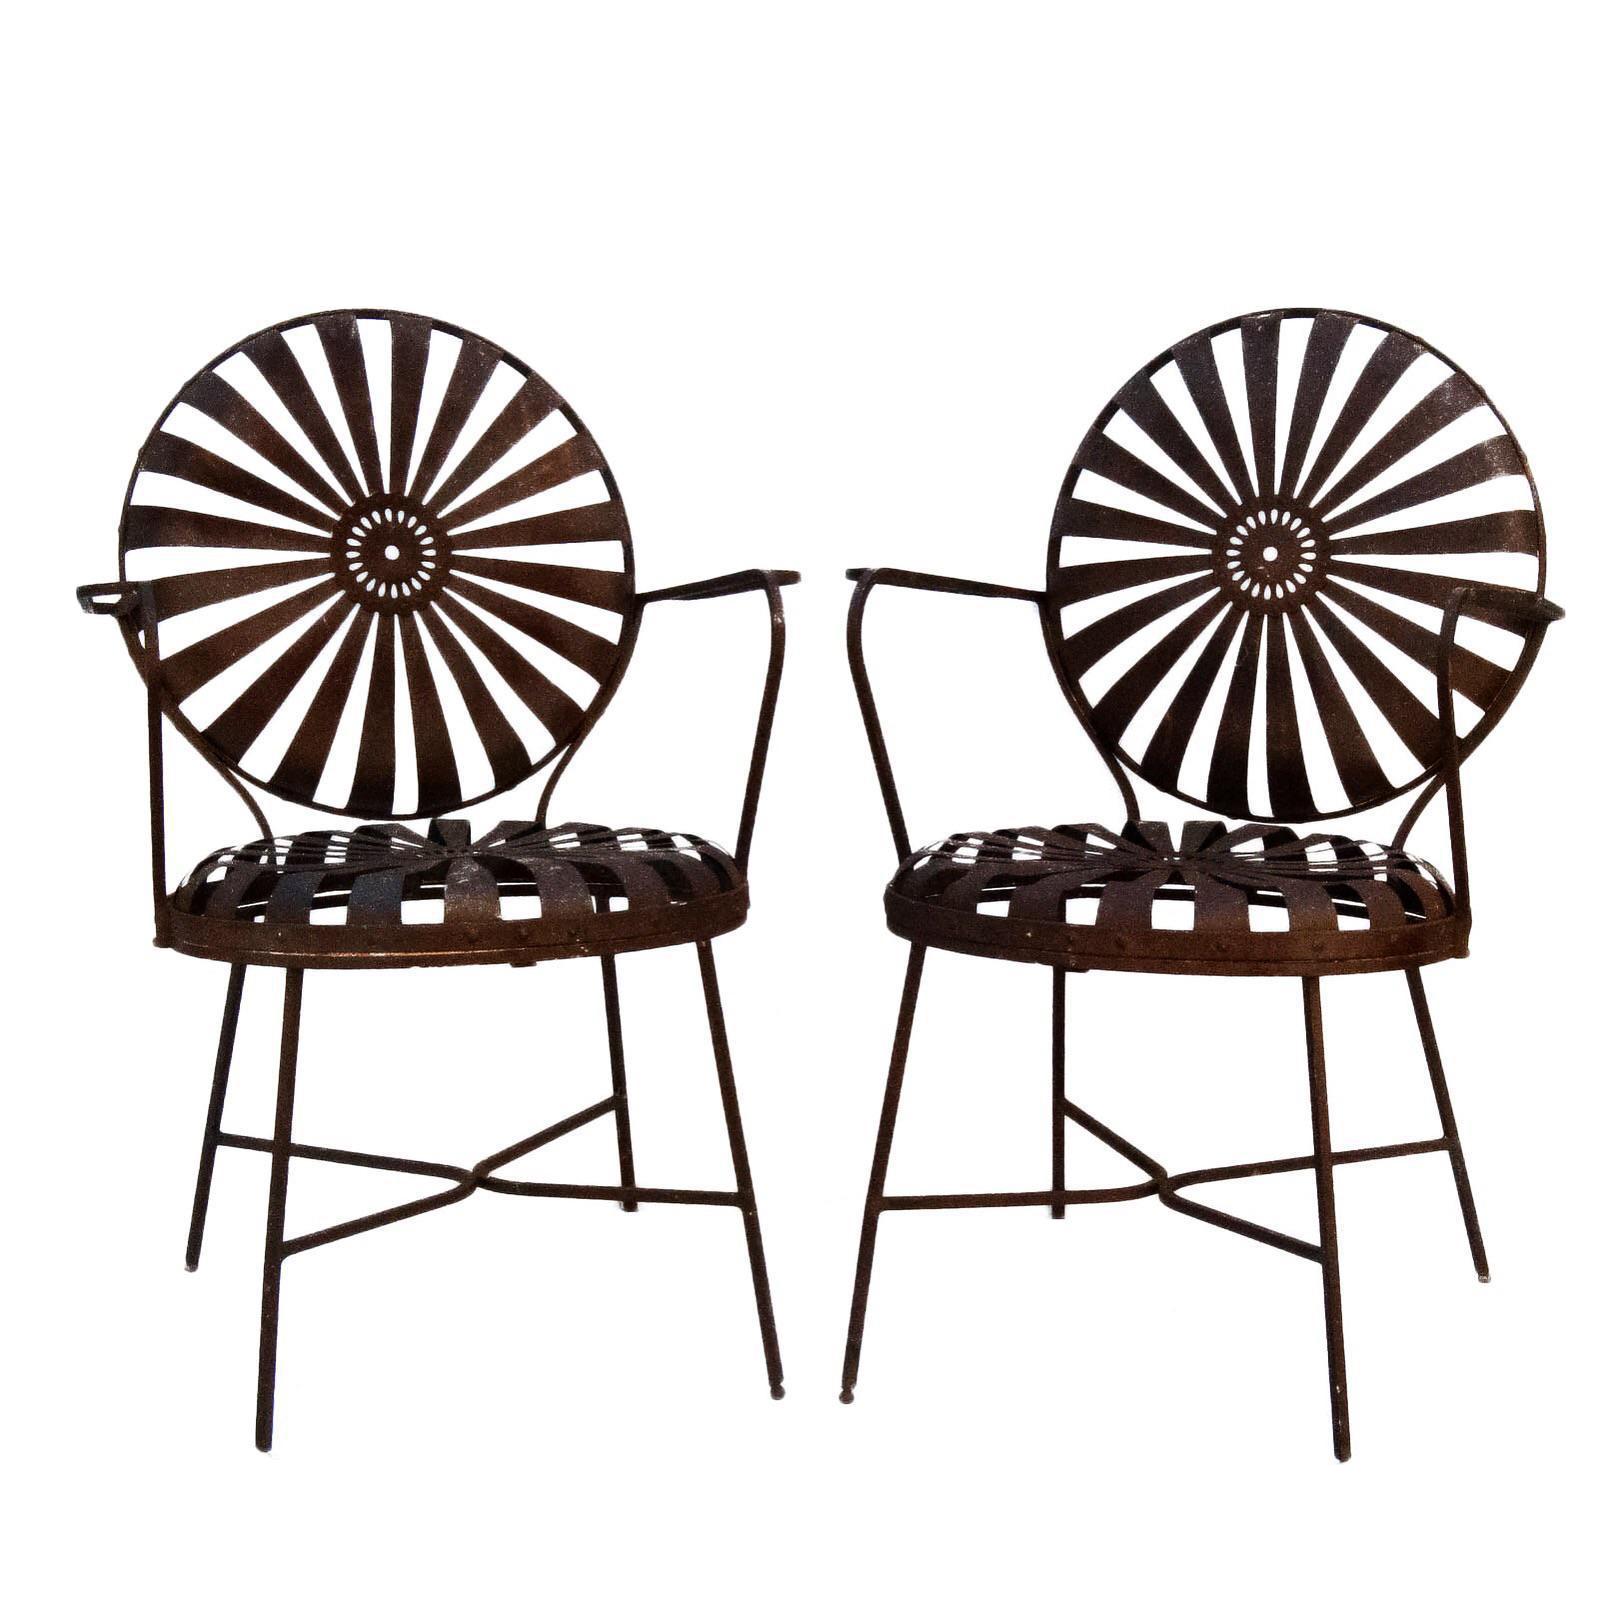 francois carre iron sunburst garden chairs a pair chairish rh chairish com